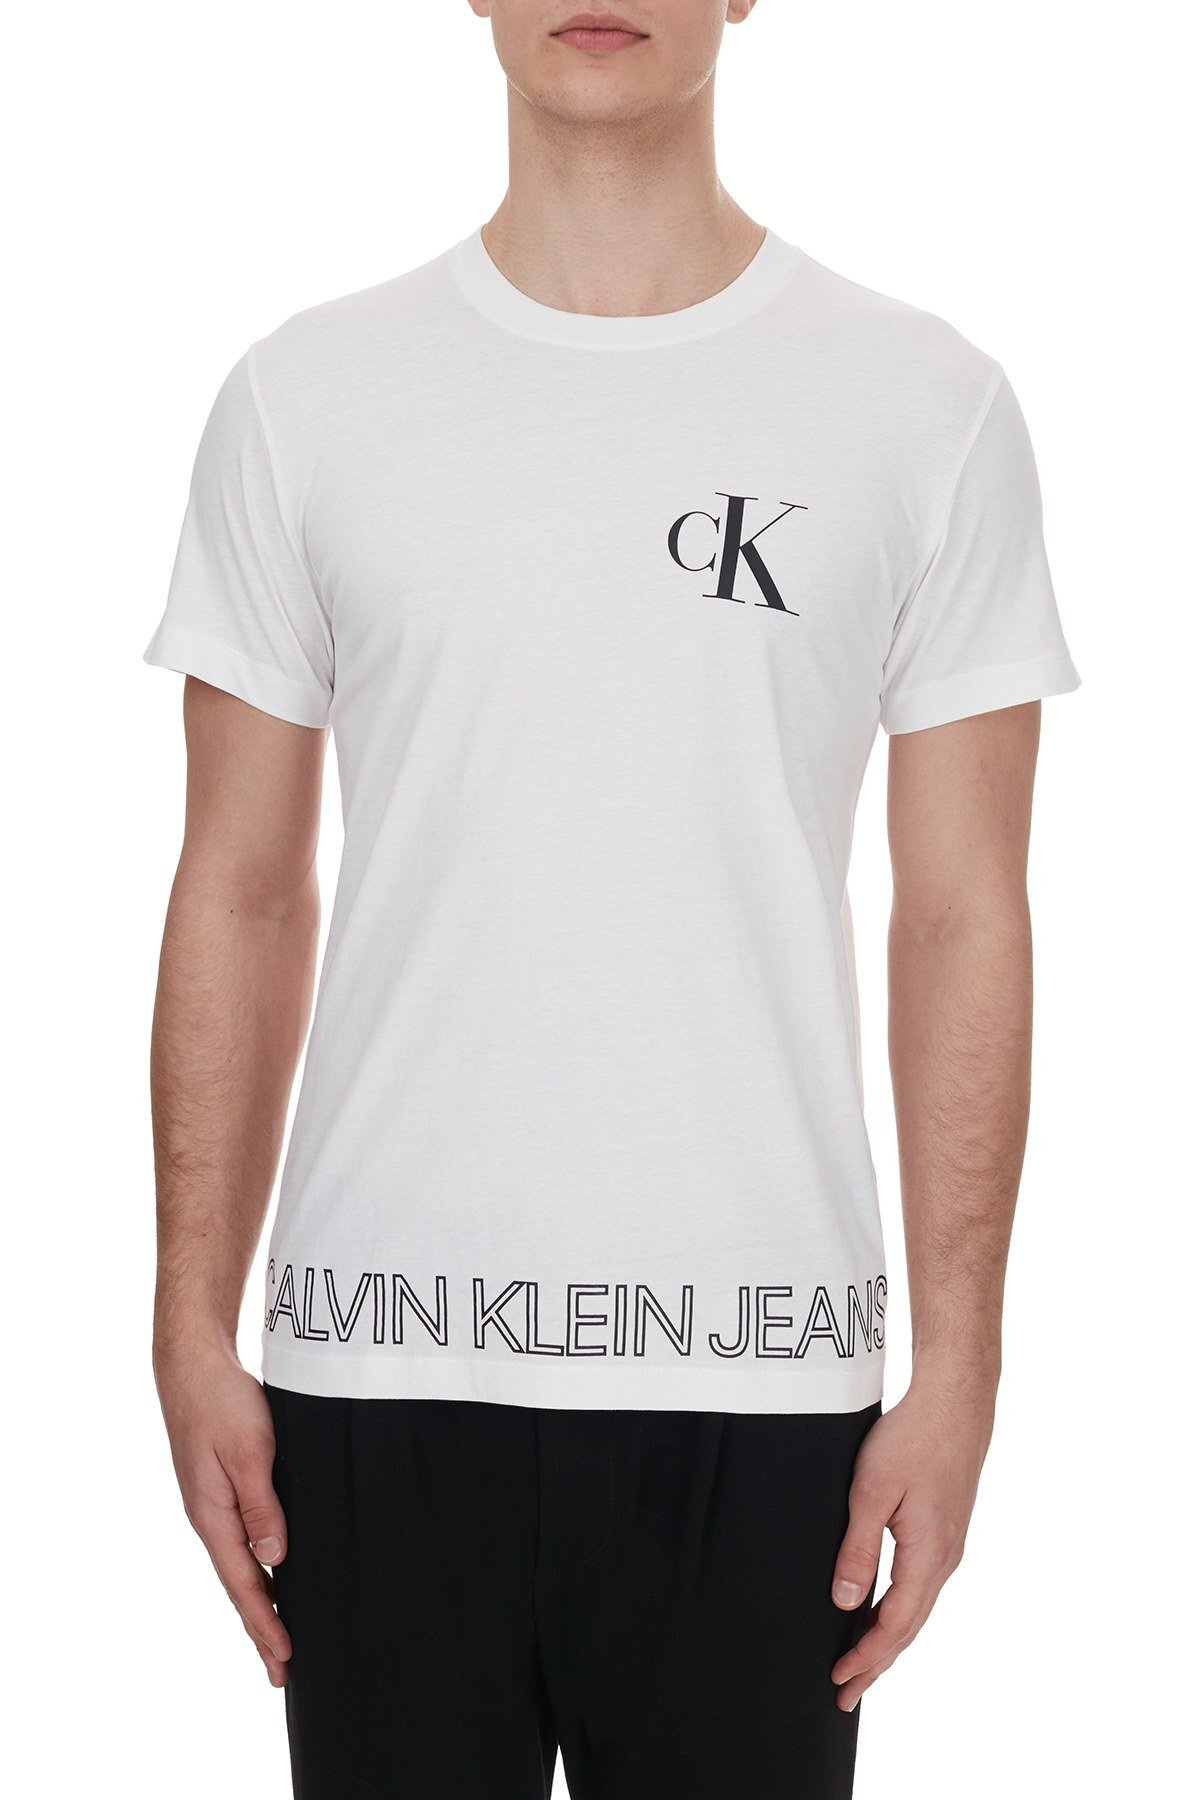 Calvin Klein Logo Baskılı Bisiklet Yaka % 100 Pamuk Erkek T Shirt J30J316457 YAF BEYAZ